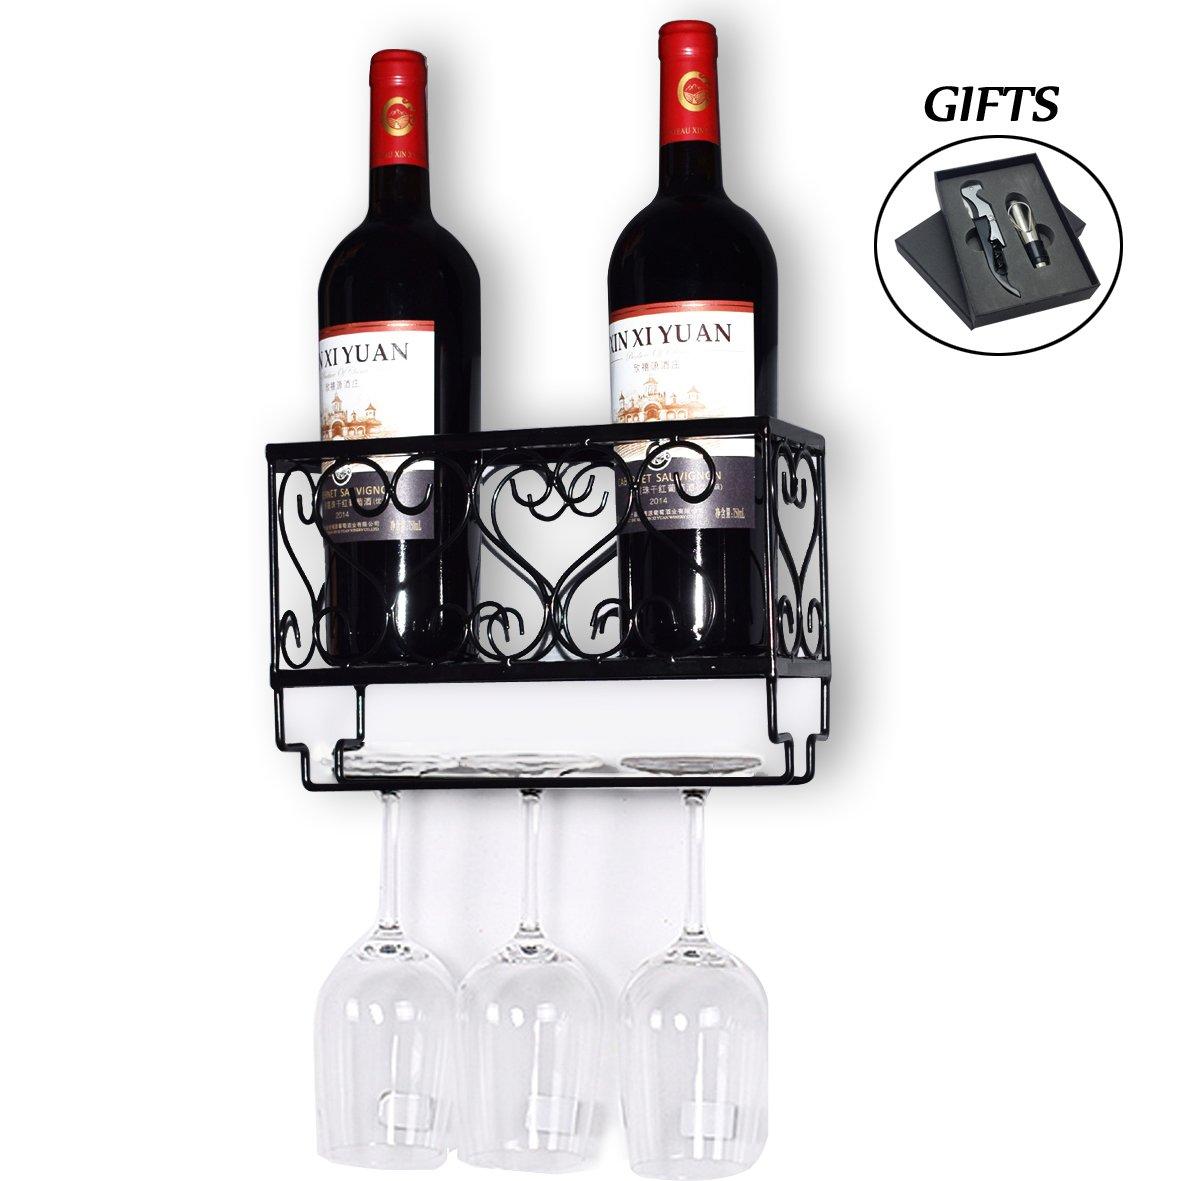 HOMEPOPULAR Metal Wall Mounted Wine Rack With Glass Holder And Bottles Opener Wine Bottle Holder For Living Room Or Kitchen,Black(Hold 2 bottles) by HOMEPOPULAR